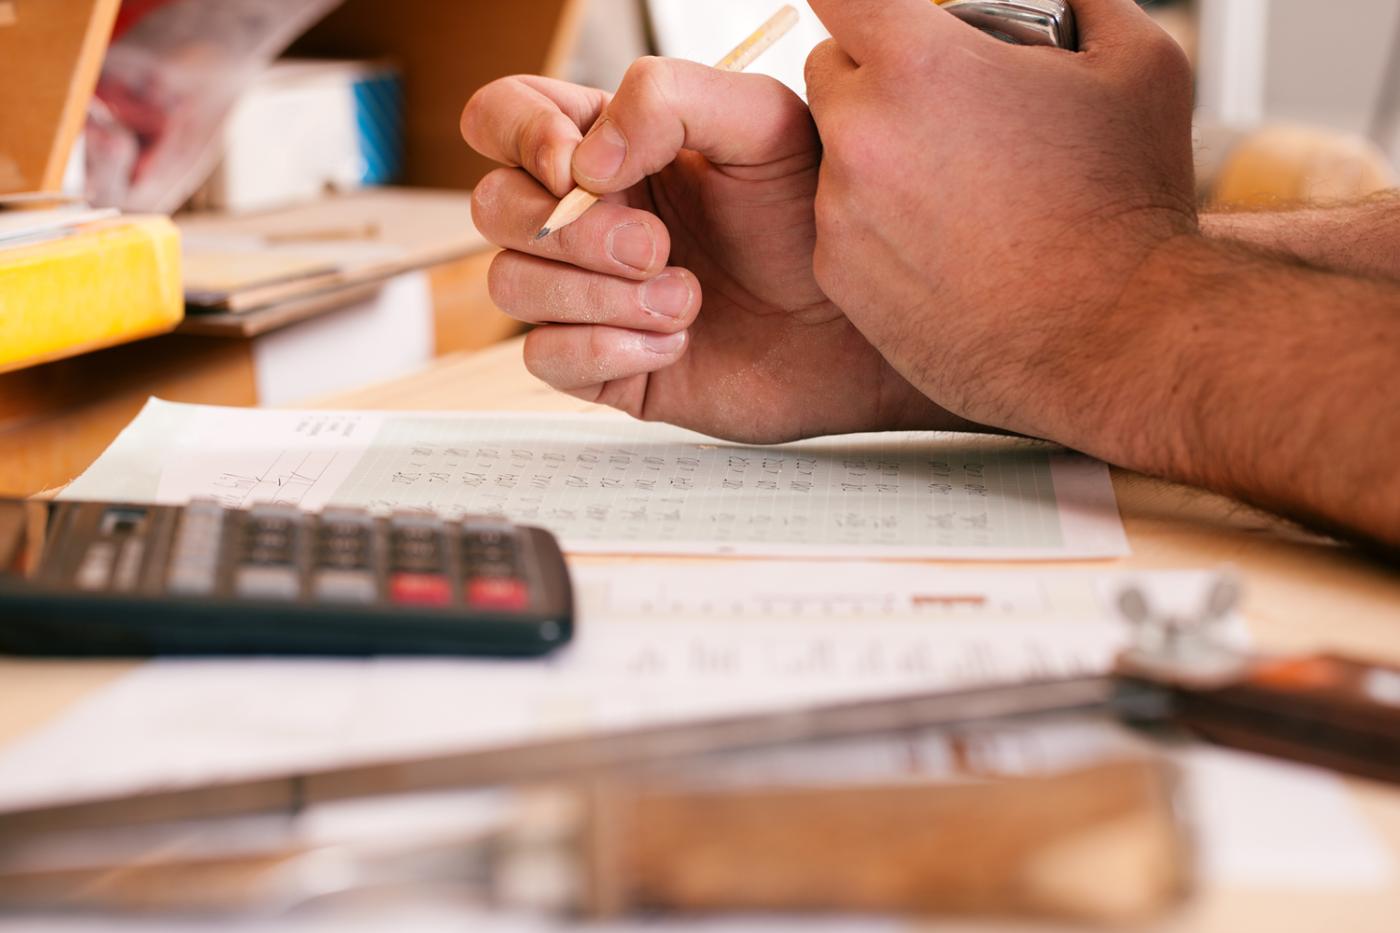 Carpentry closeup of man using pencil